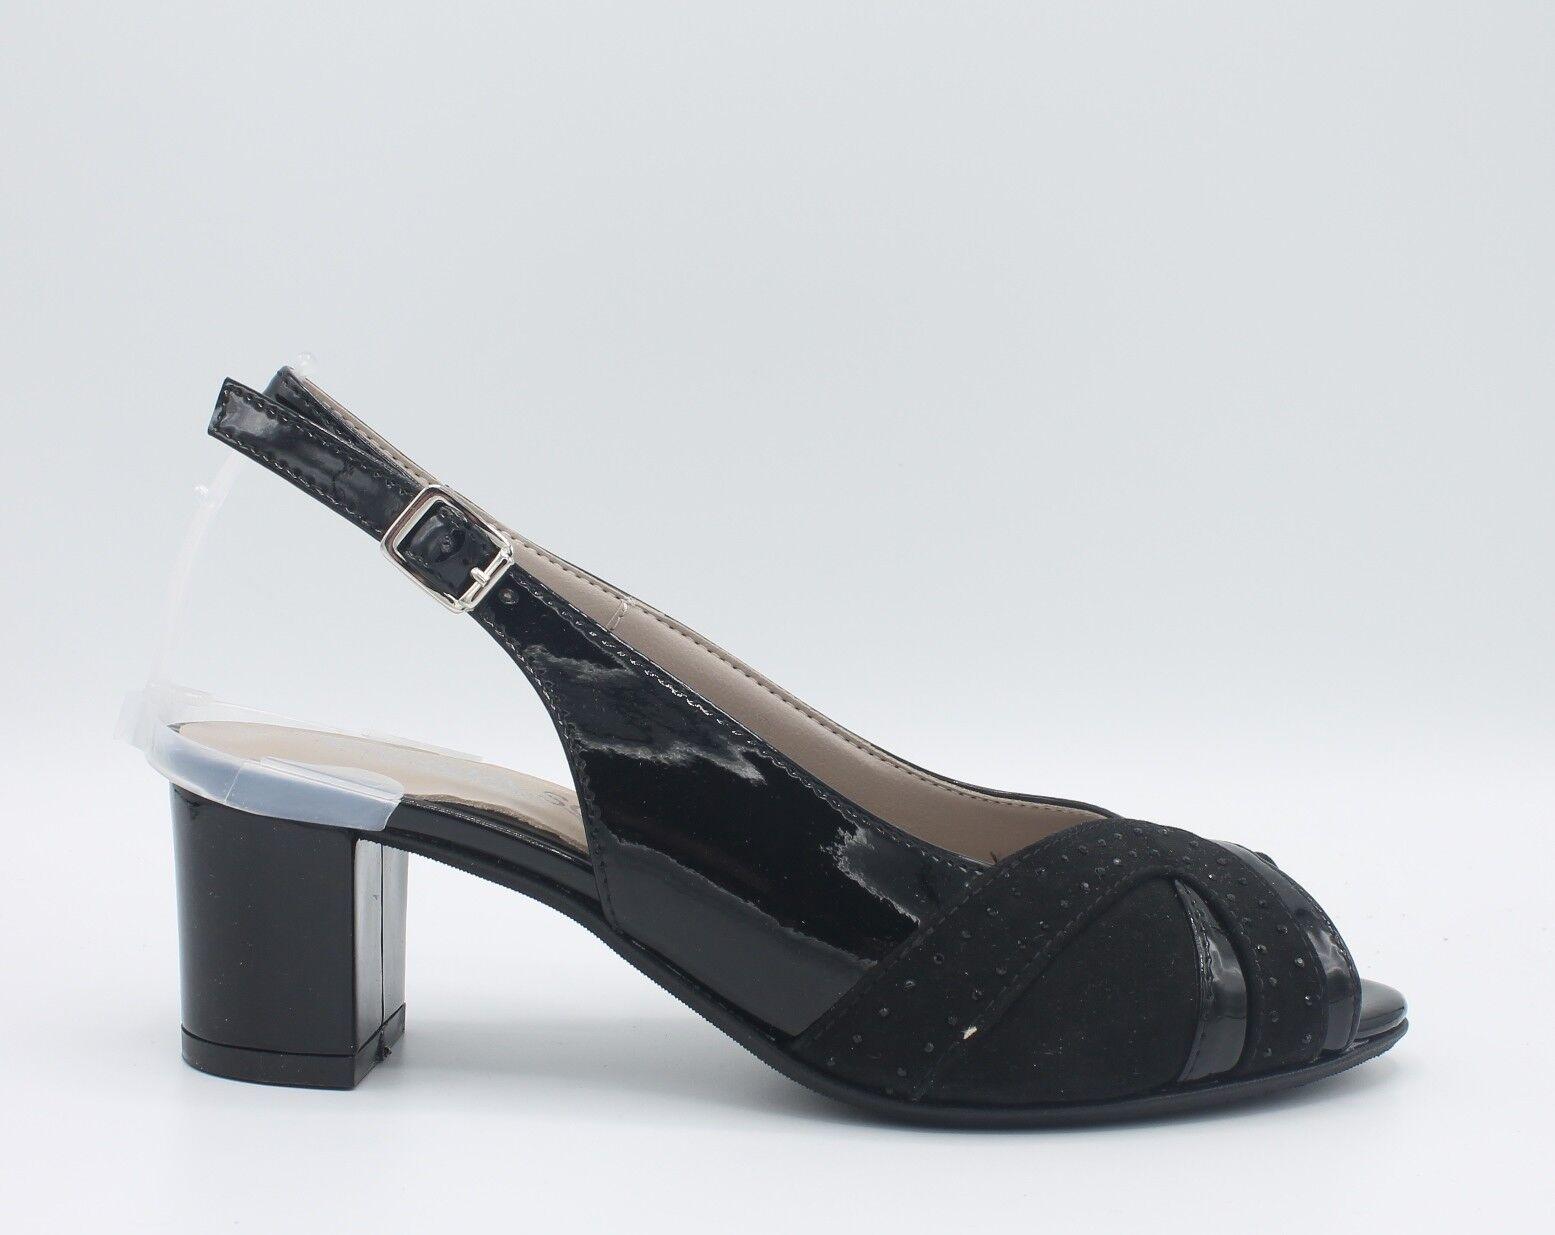 CINZIA SOFT Sandali in donna eleganti linea comoda in Sandali pelle vernice nero IAB292318 5b9f4c